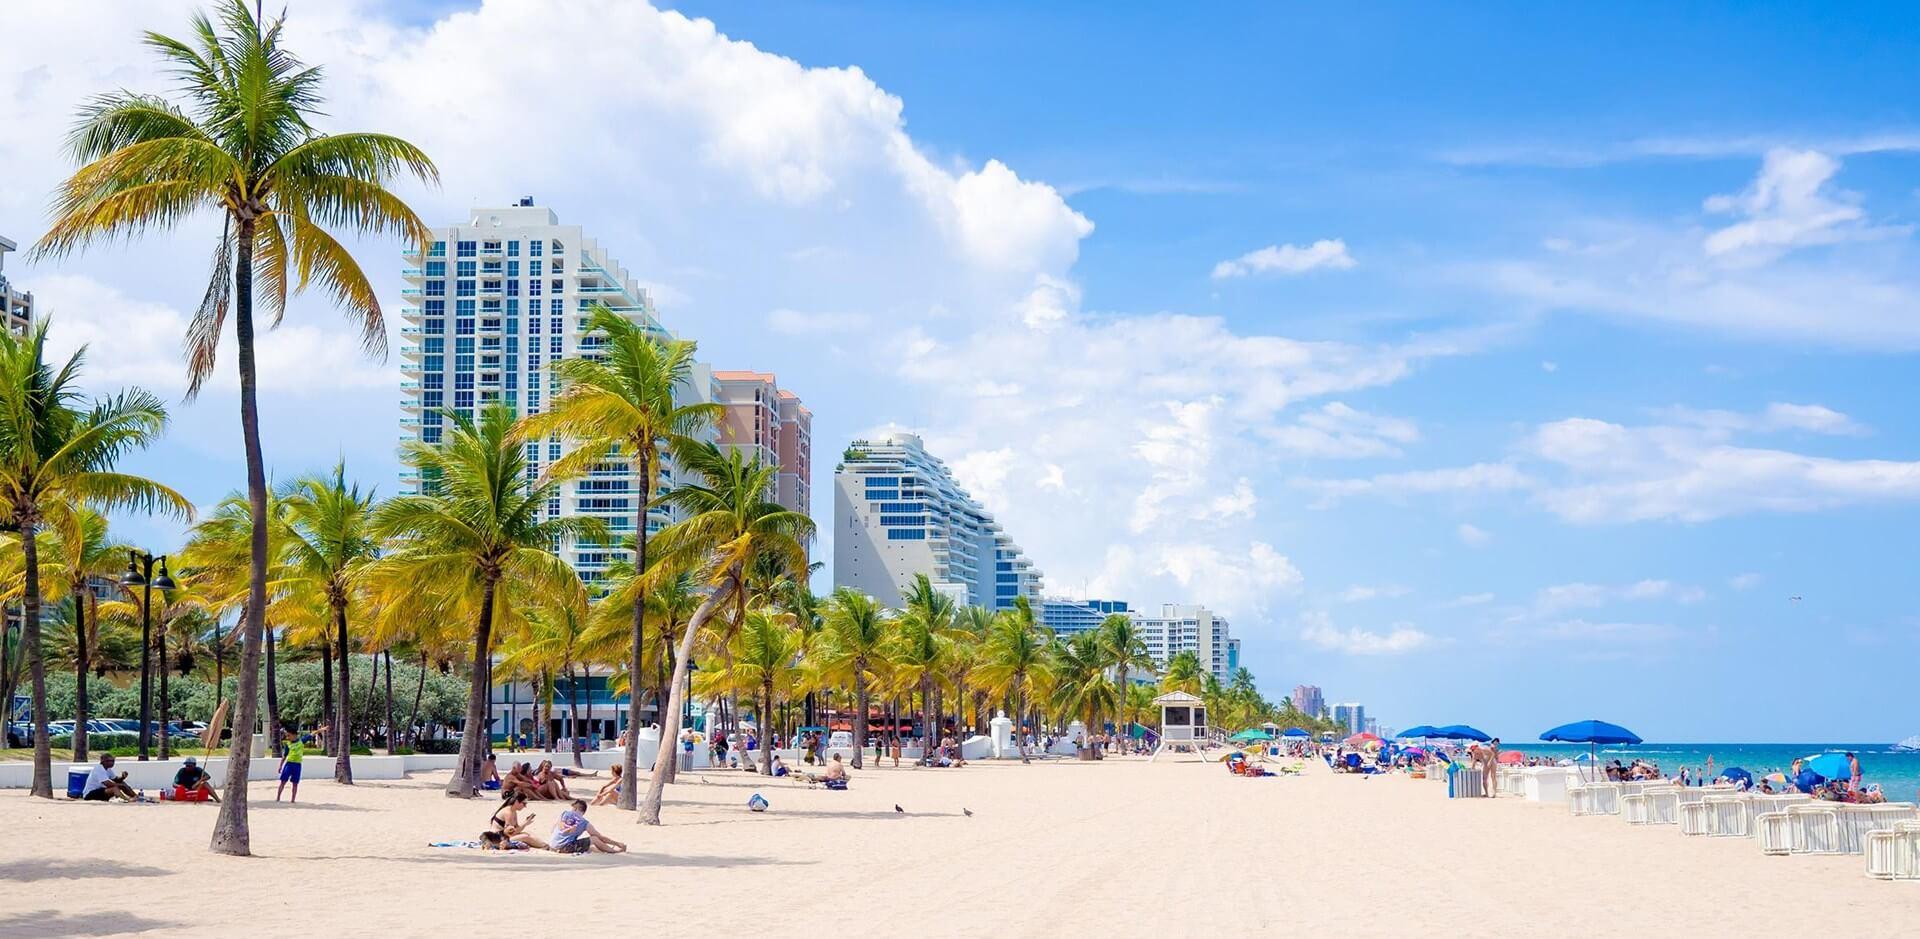 Praias em Fort Lauderdale: Fort Lauderdale Beach